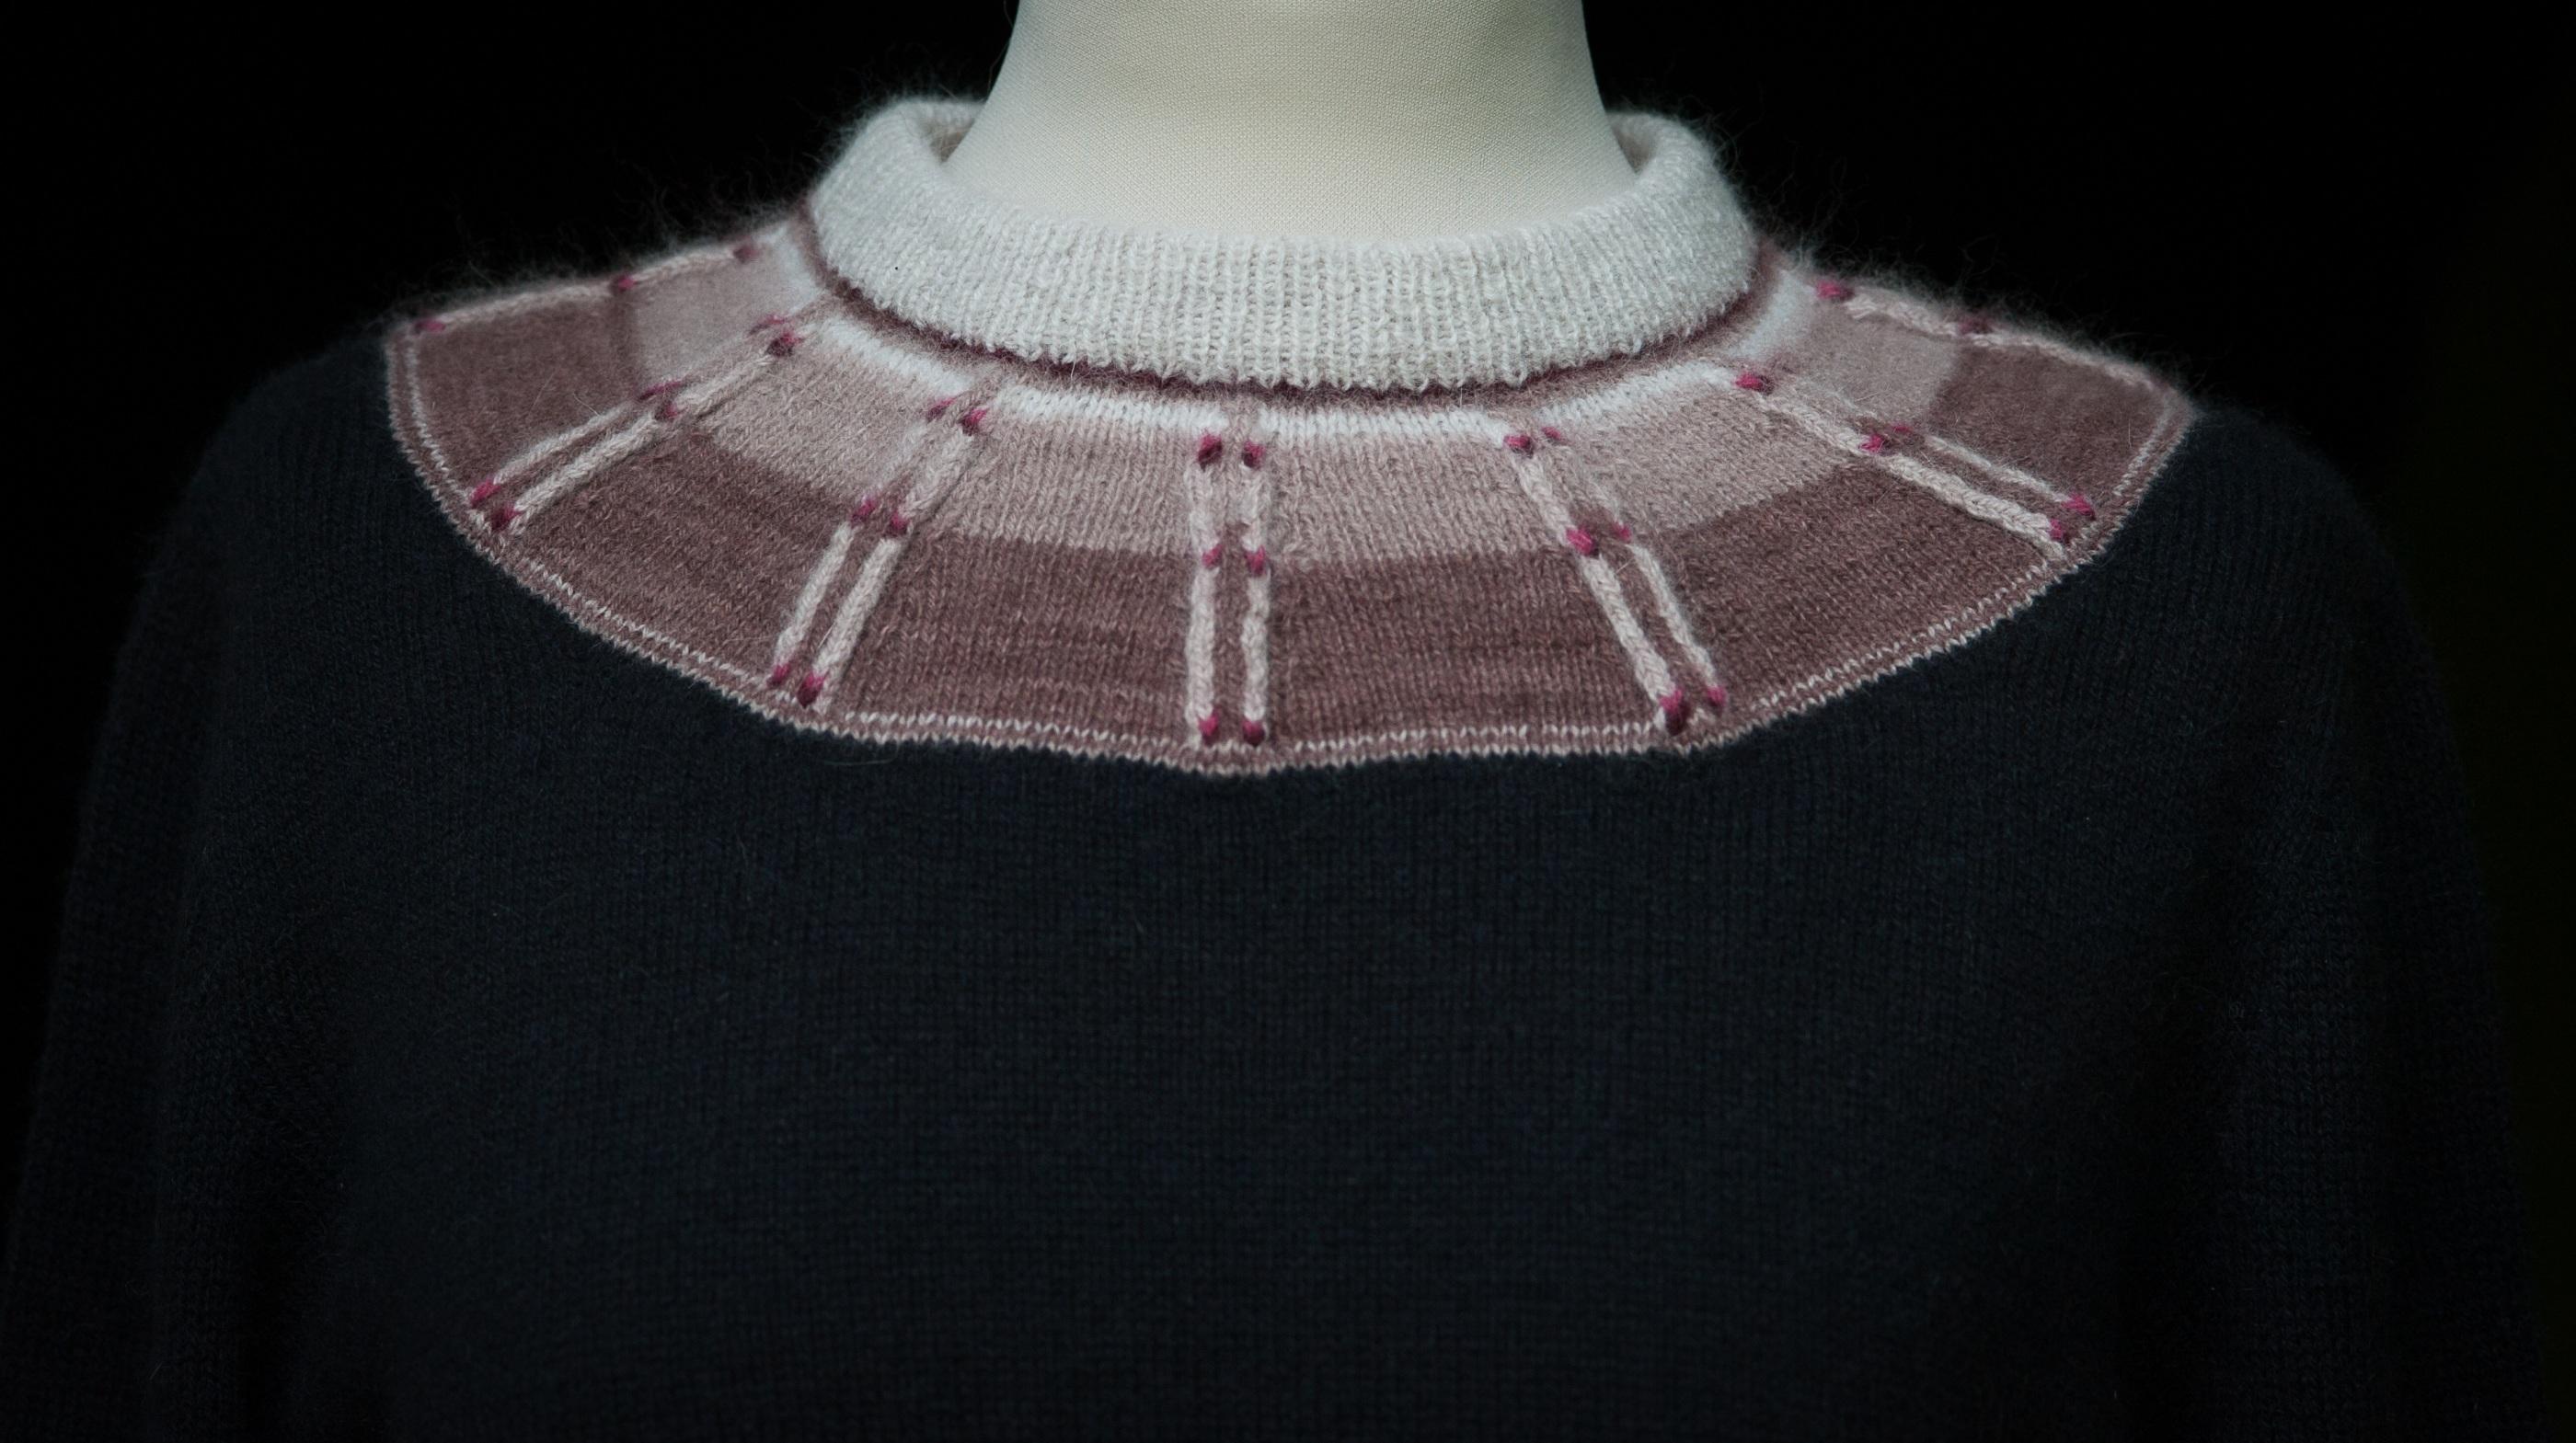 Bohus Stickning Rådjurspåret Red pullover , foto Karin Björk